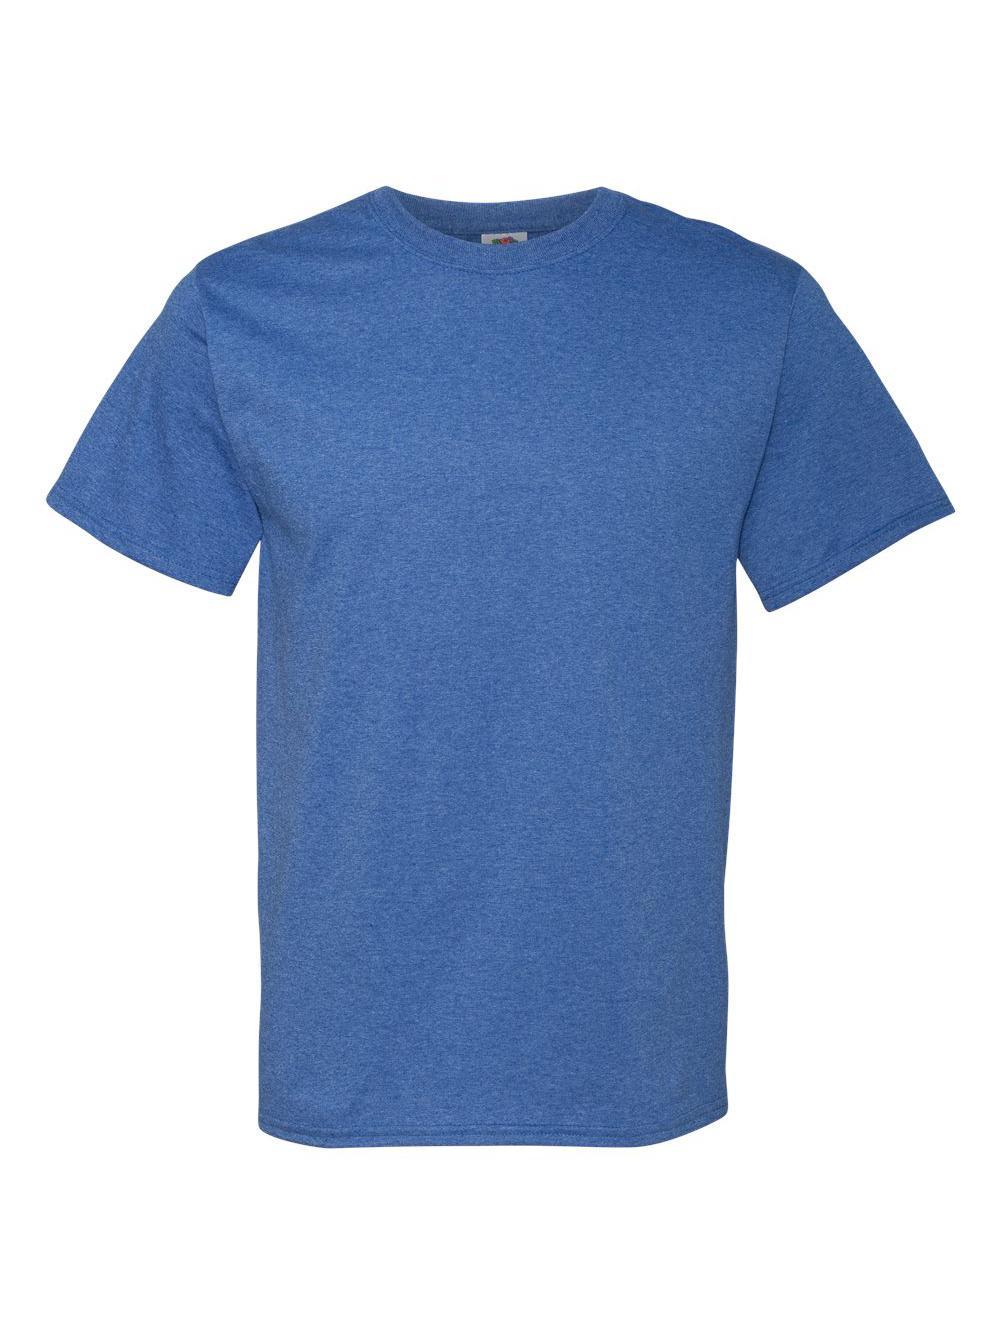 Fruit-of-the-Loom-HD-Cotton-Short-Sleeve-T-Shirt-3930R thumbnail 108